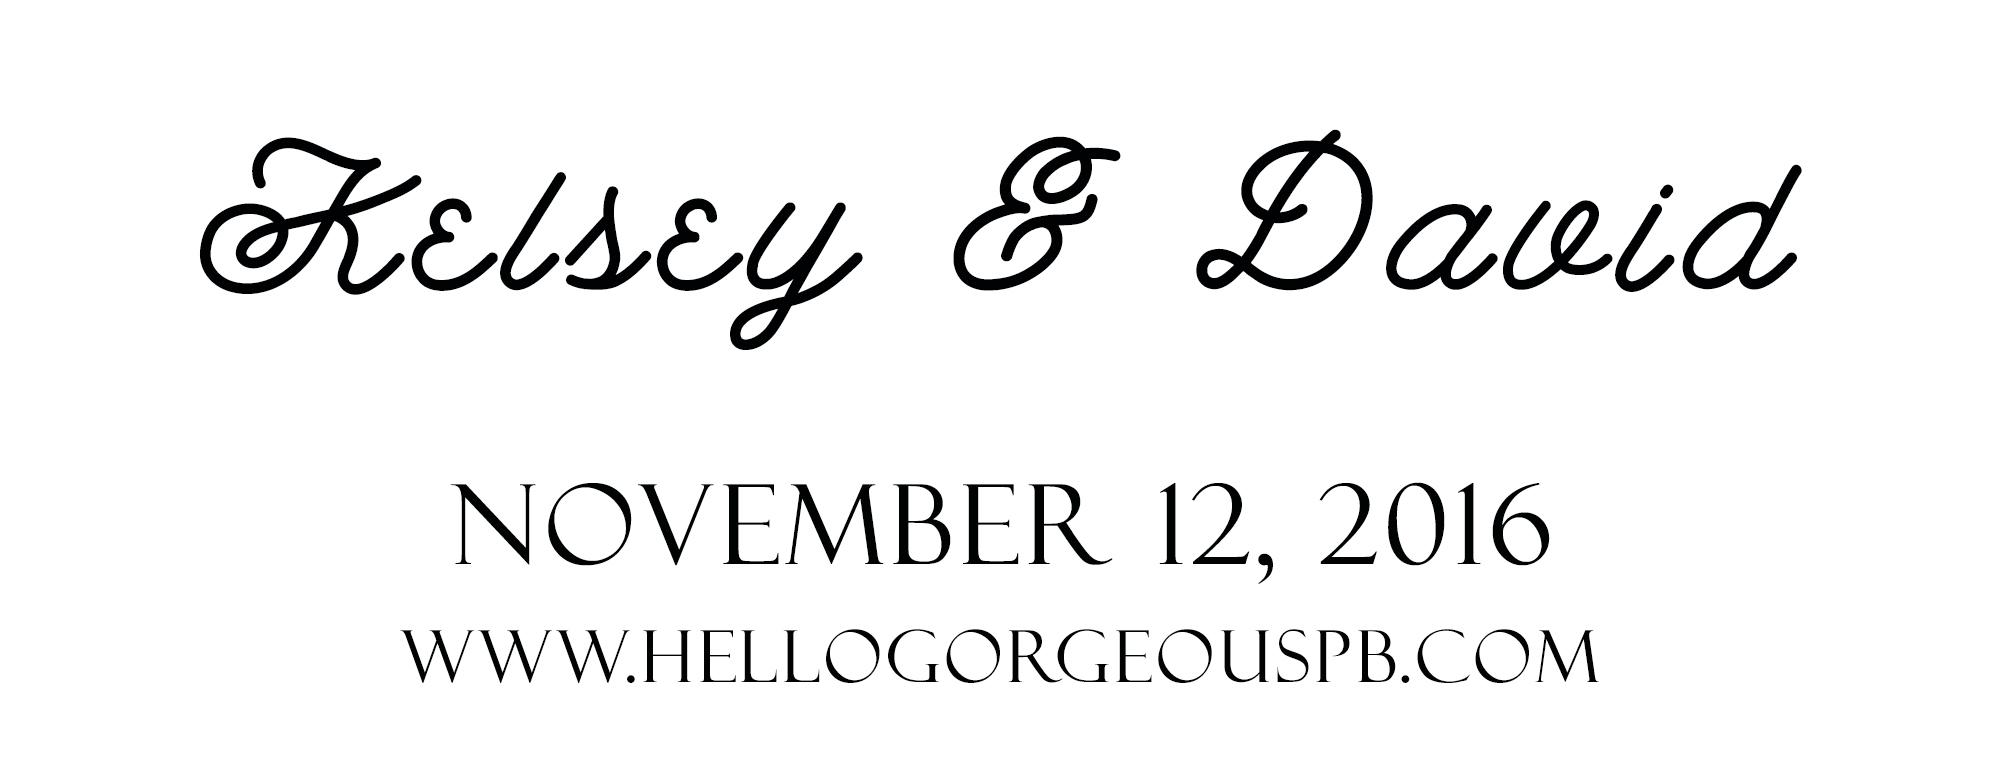 Kelsey & David's Wedding